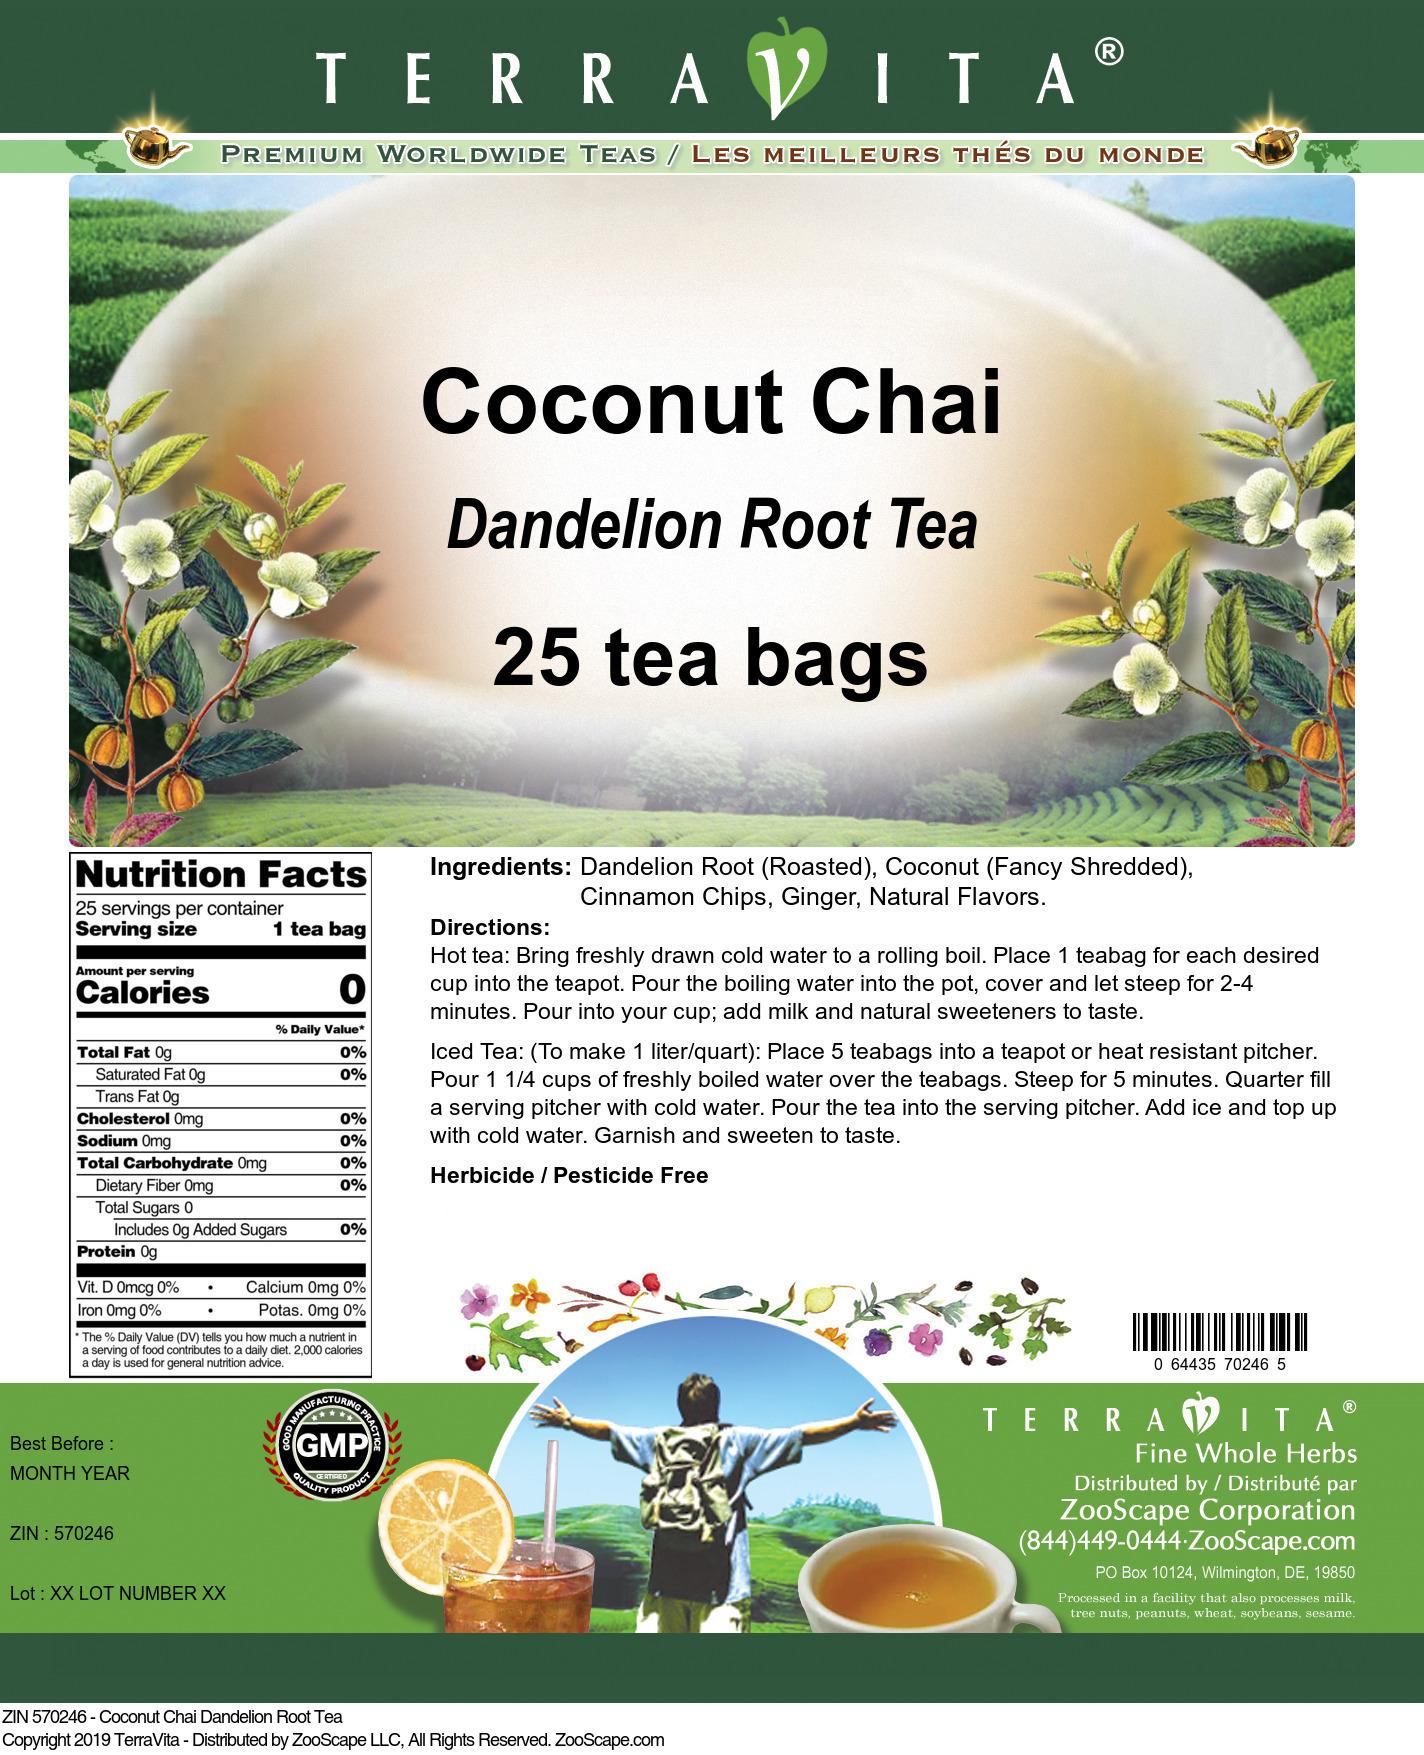 Coconut Chai Dandelion Root